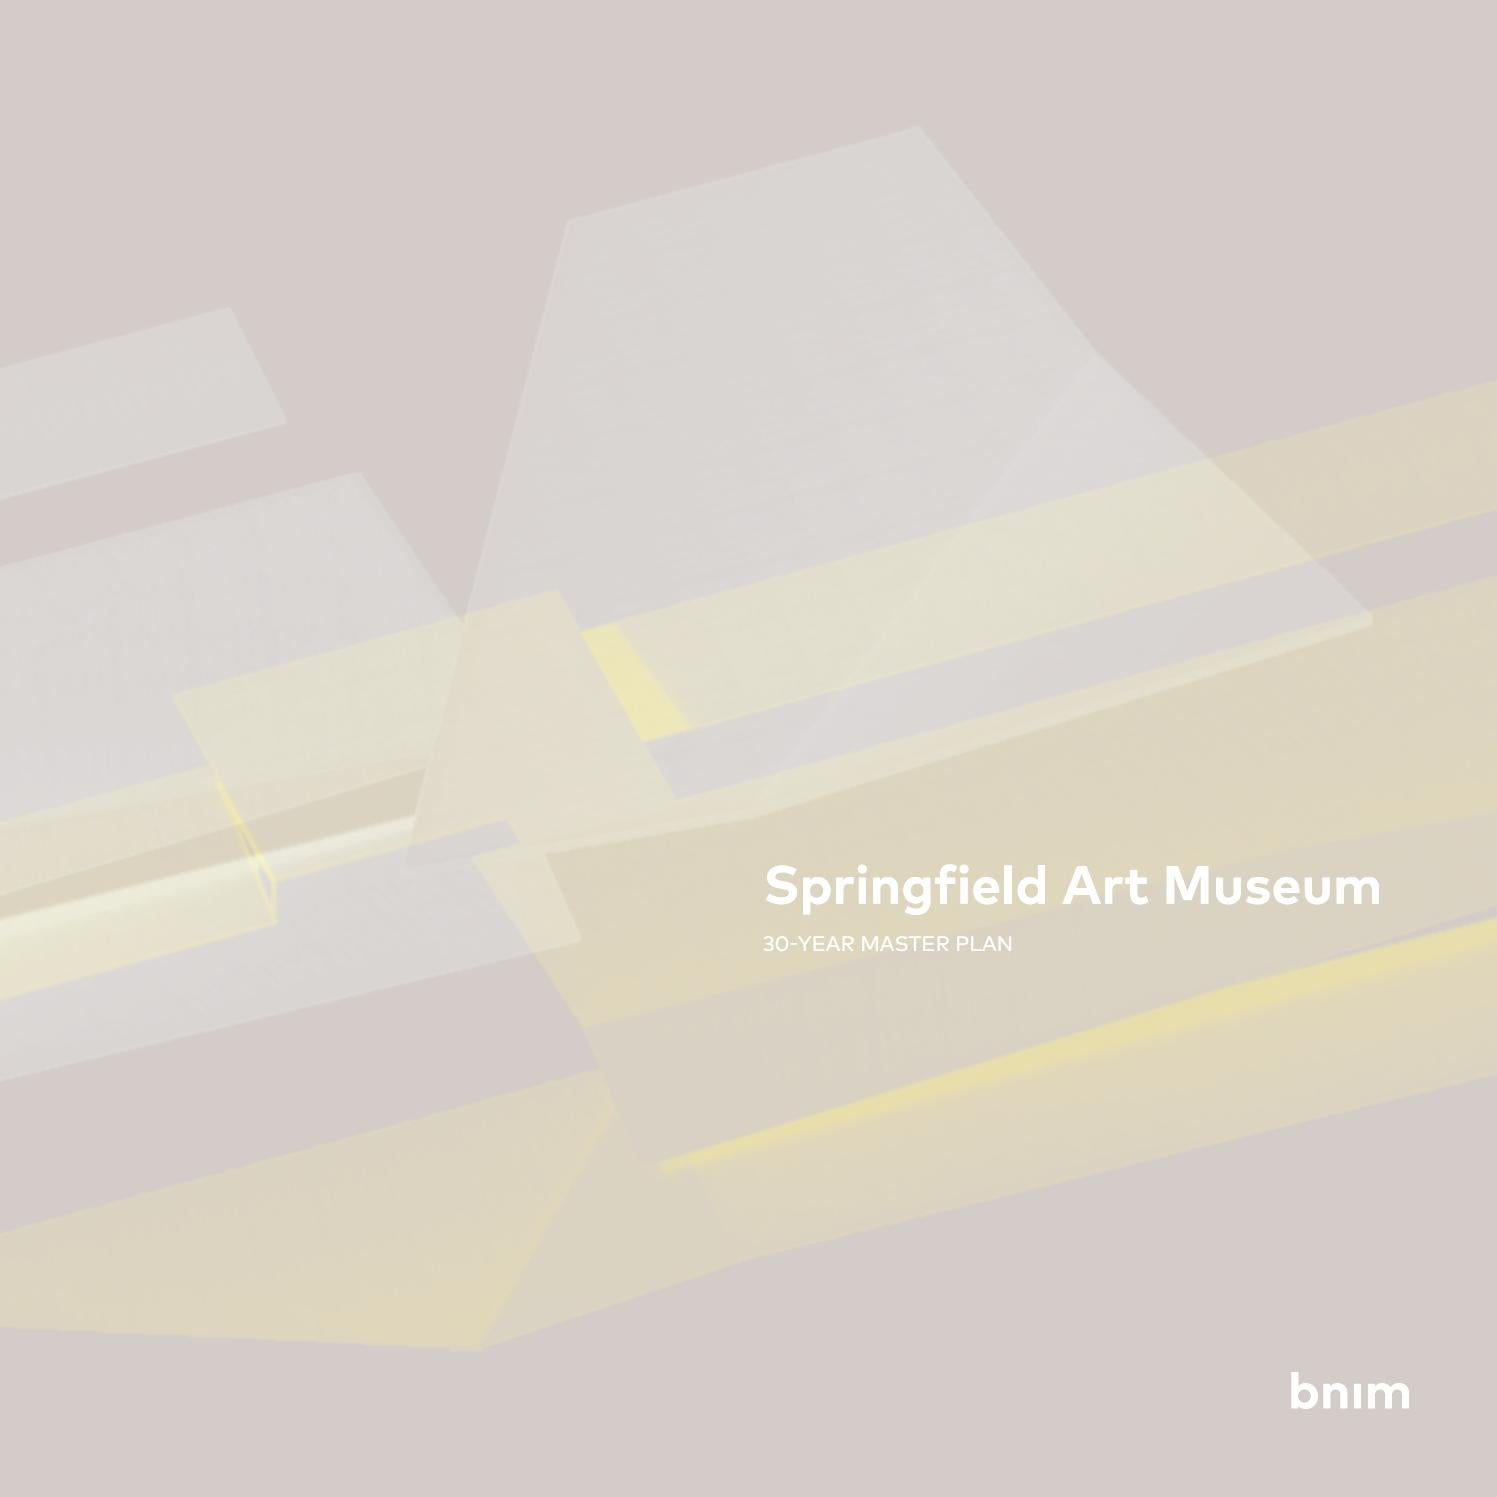 Springfield Art Museum by BNIM - issuu